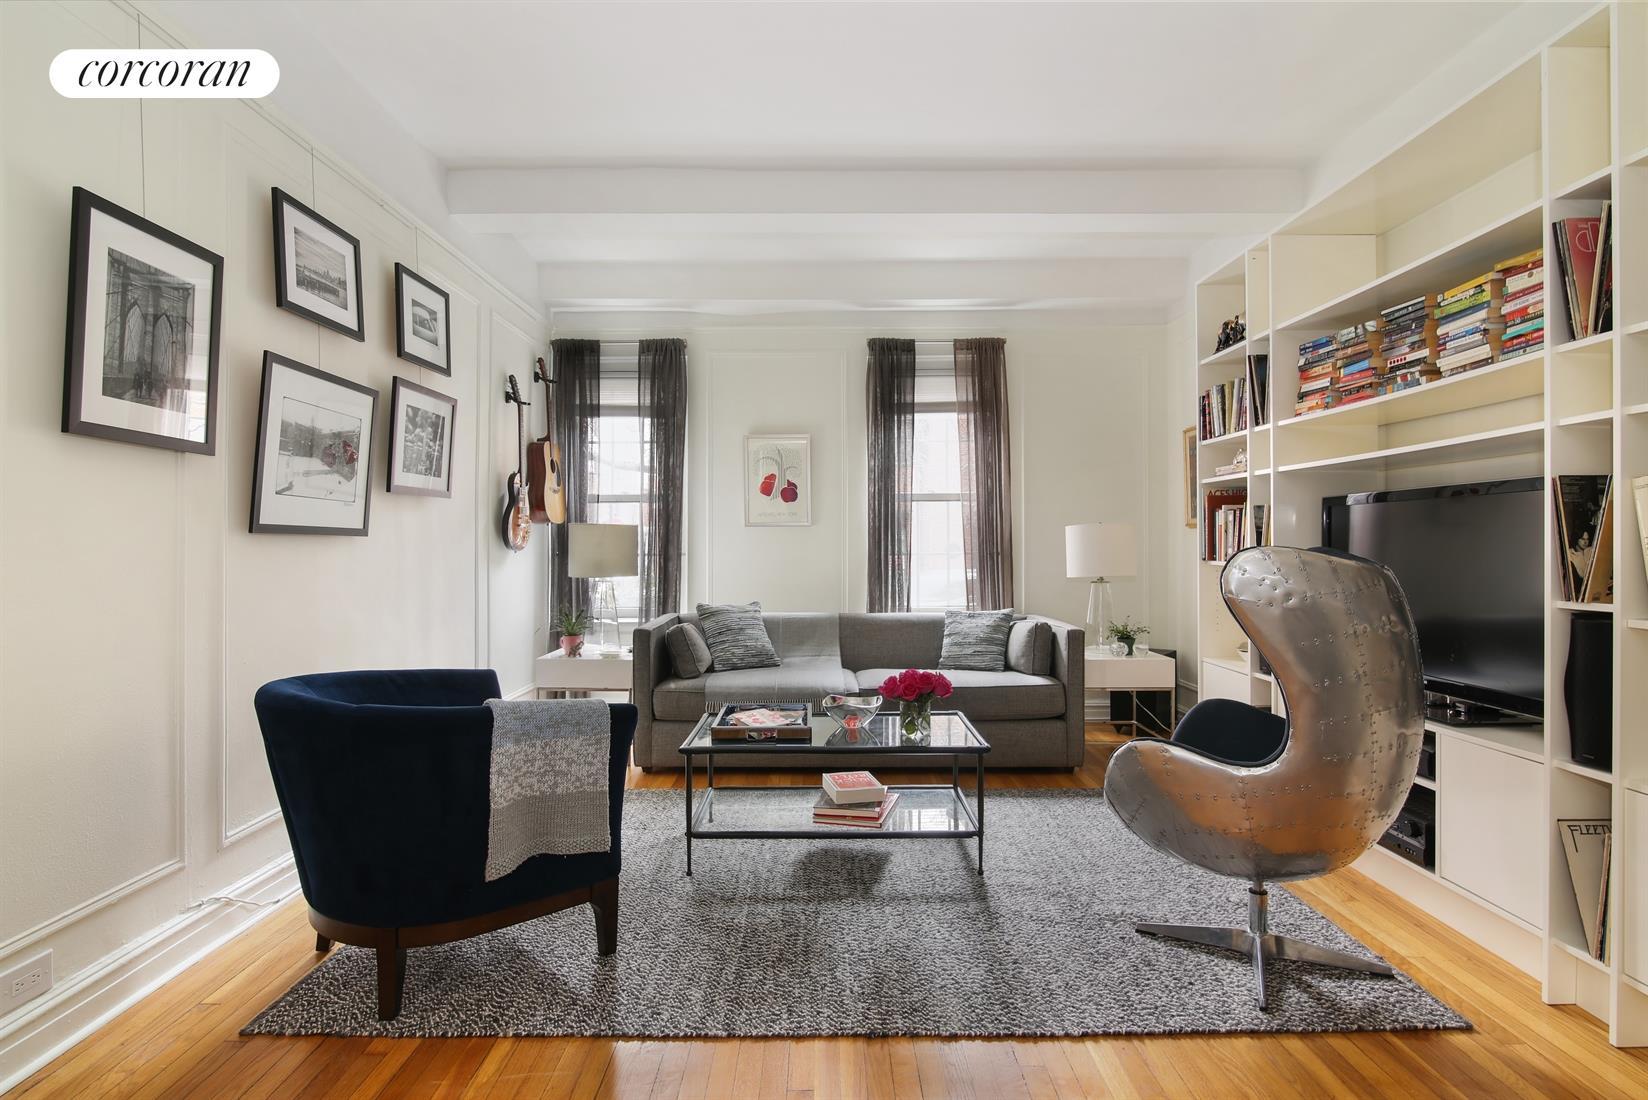 Corcoran, 155 Henry Street, Apt. 1G, Brooklyn Heights Real ...